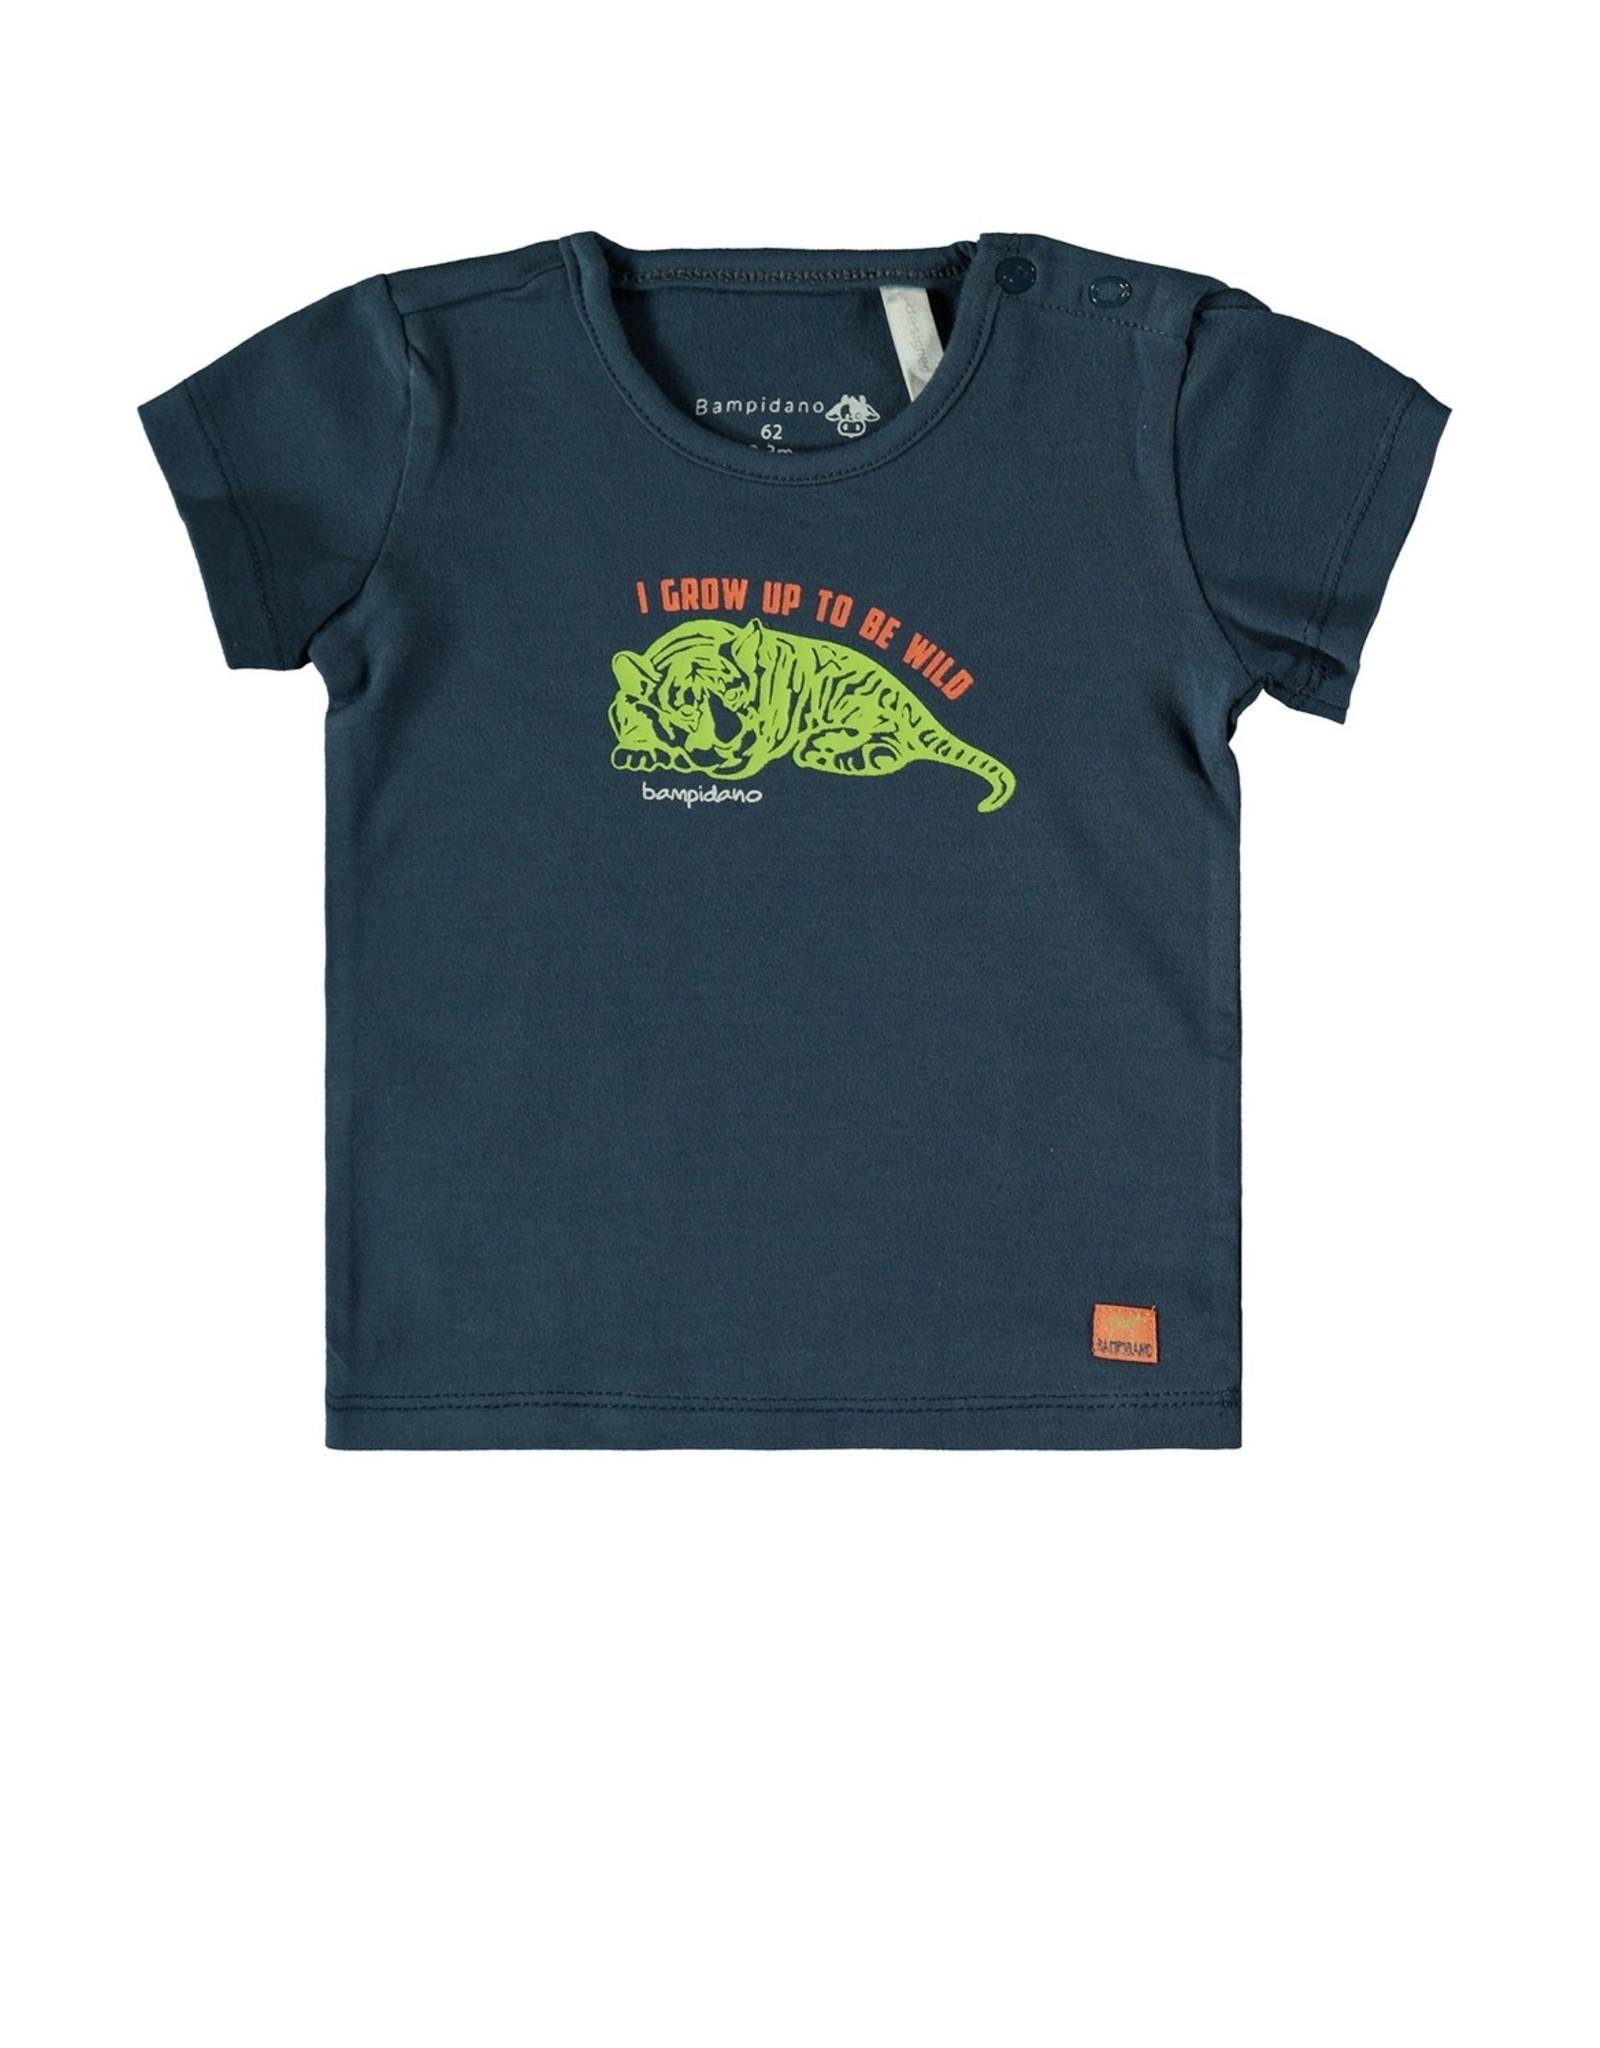 Bampidano Baby Boys T-shirt s/s plain GROW UP / SAFARI, blue